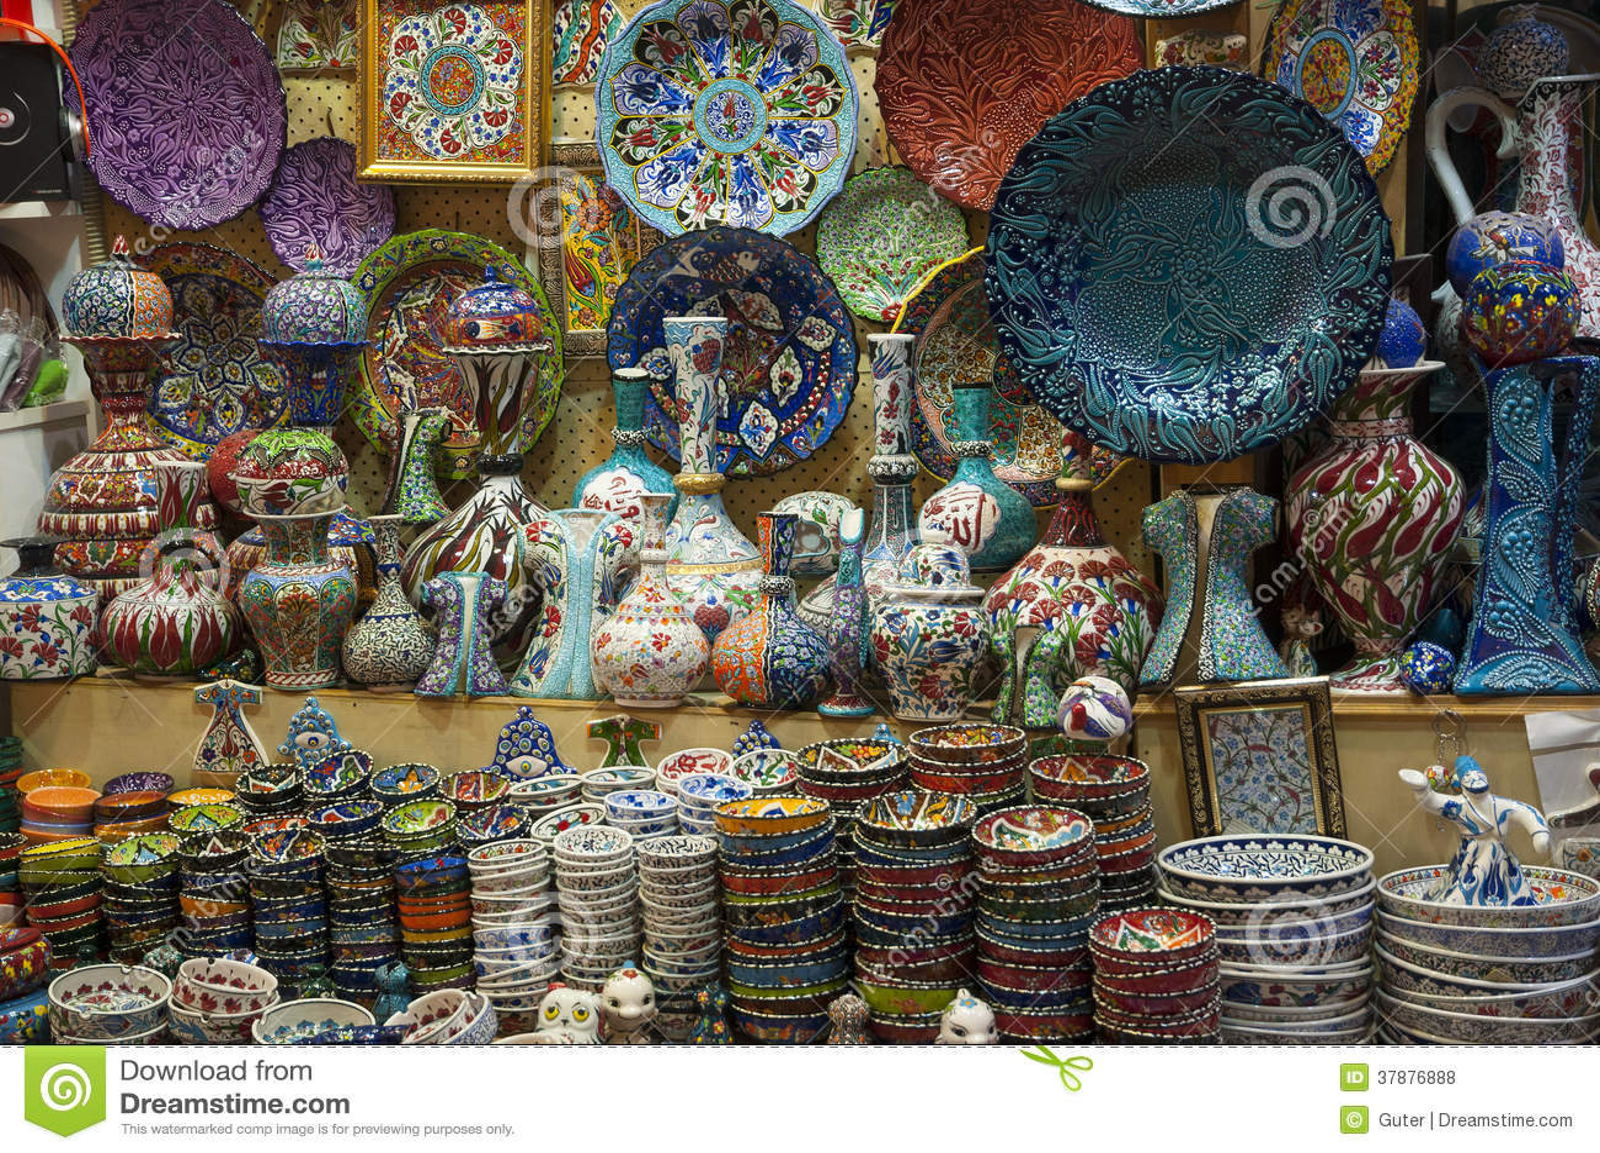 Istanbul bazar, Turkey stock photo  Image of constantinople - 37876888